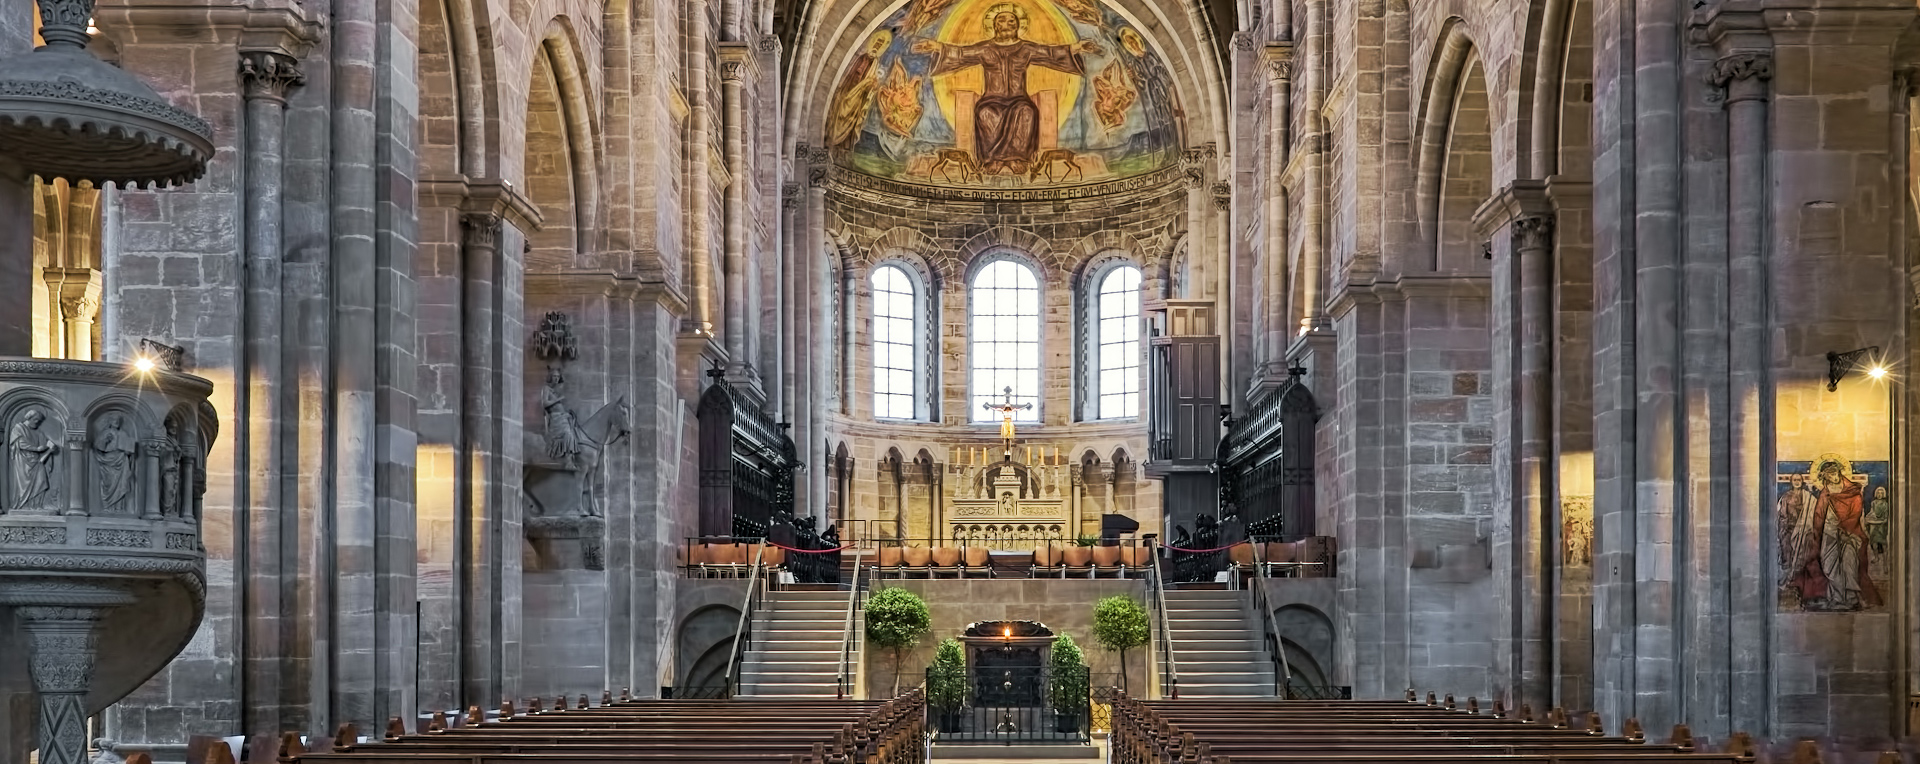 Bamberger Dom Innenansicht